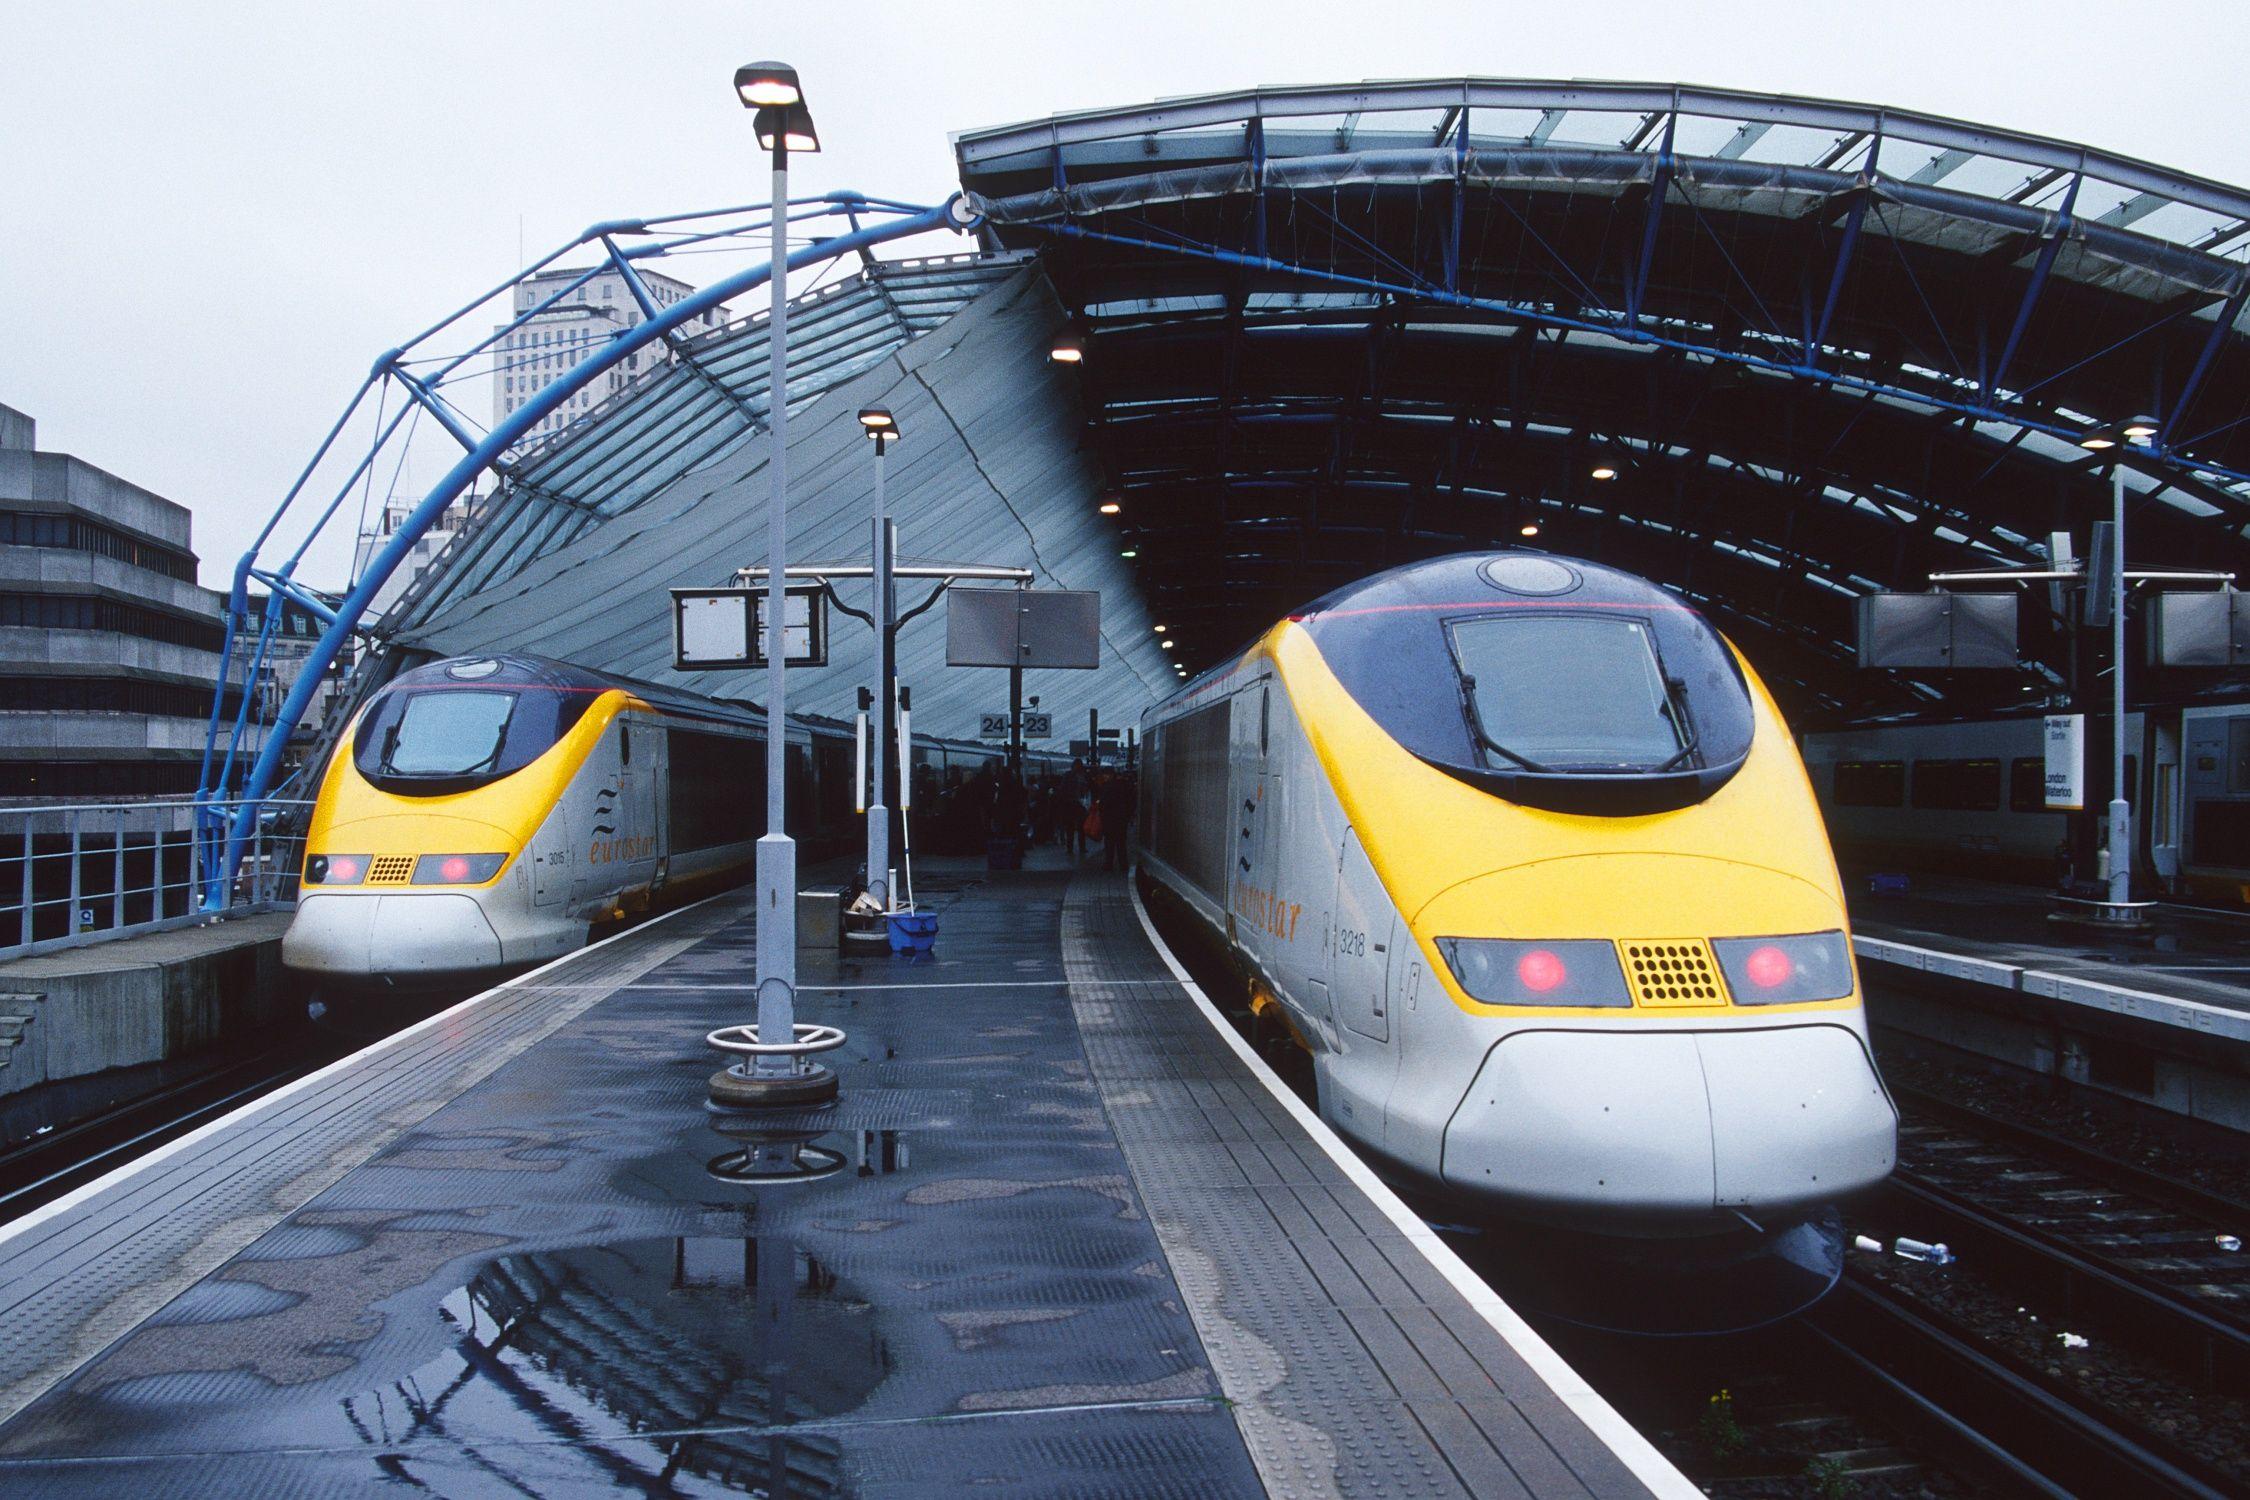 Canvas Eurostar Passenger Train at Waterloo Station Art print POSTER